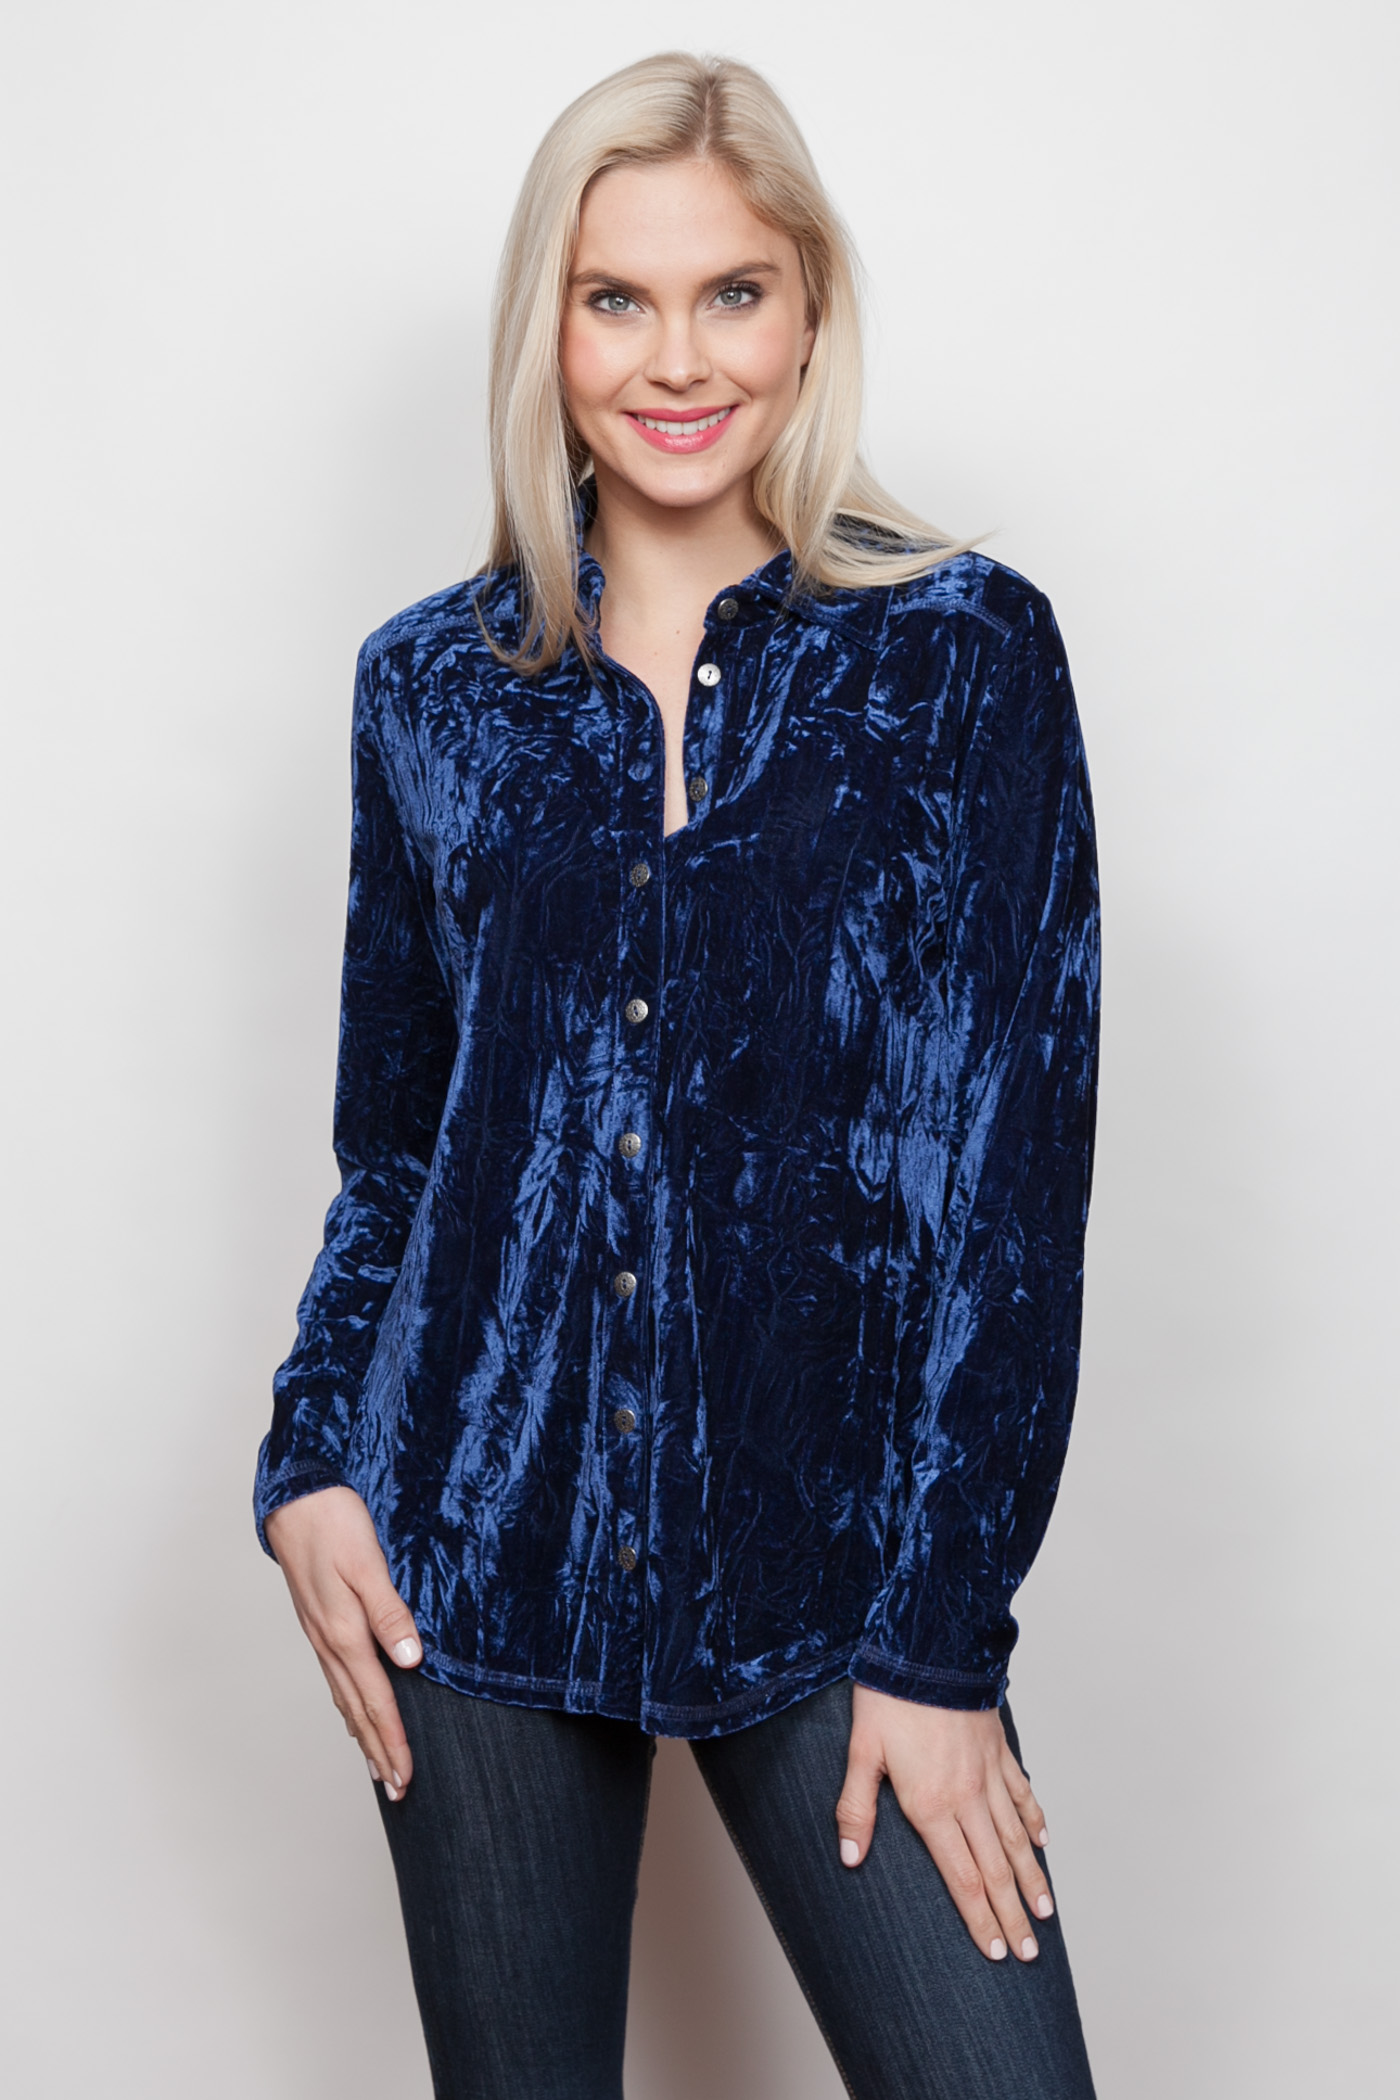 Copy of Style # 15379-18, p 12 </br>Crinkled Crushed Velvet </br>Color: Sapphire + Black, Merlot